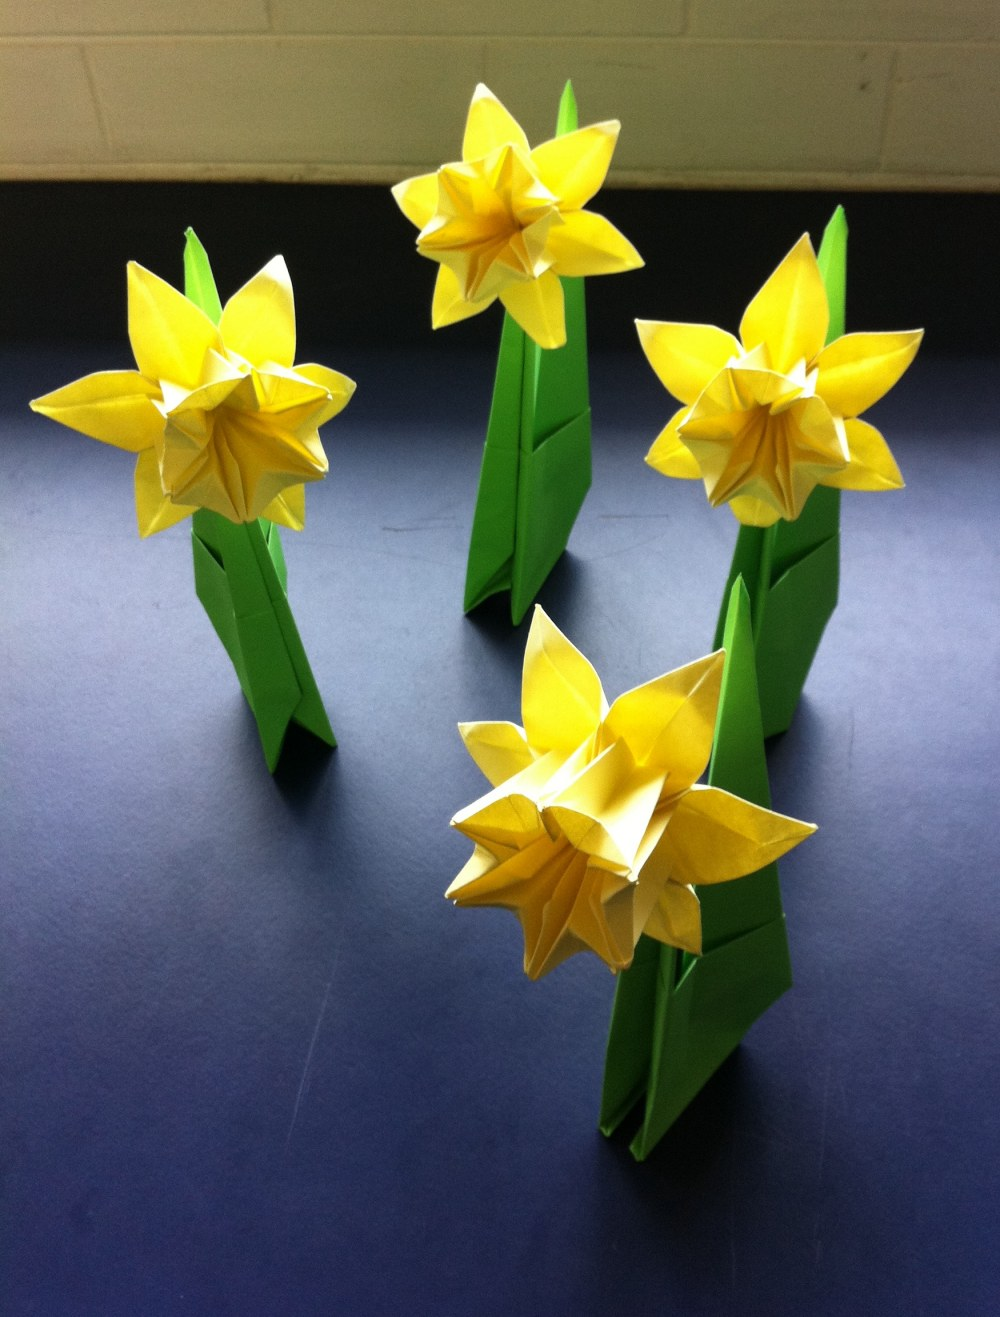 238 Daffodil Day Setting The Crease